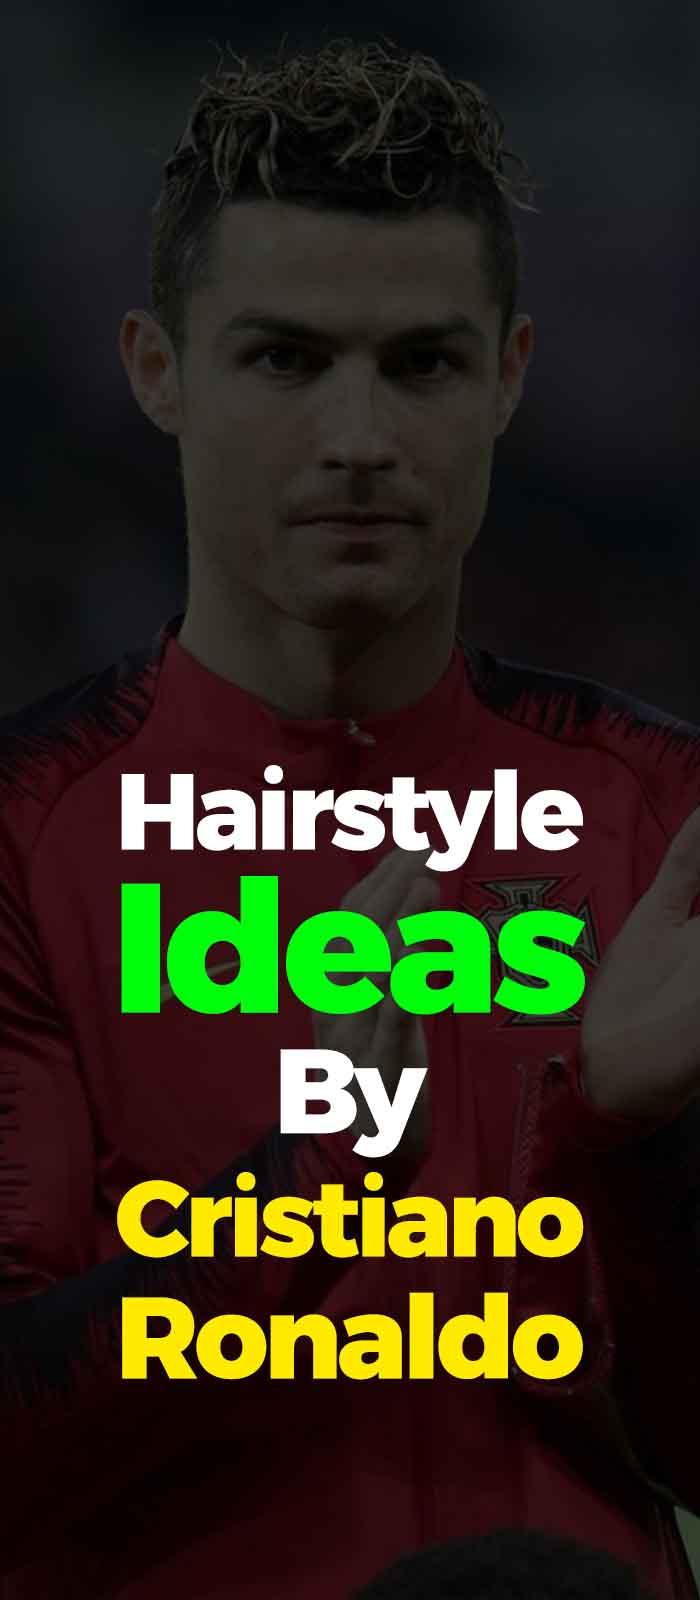 Hairstyle Looks Cristiano Ronaldo!